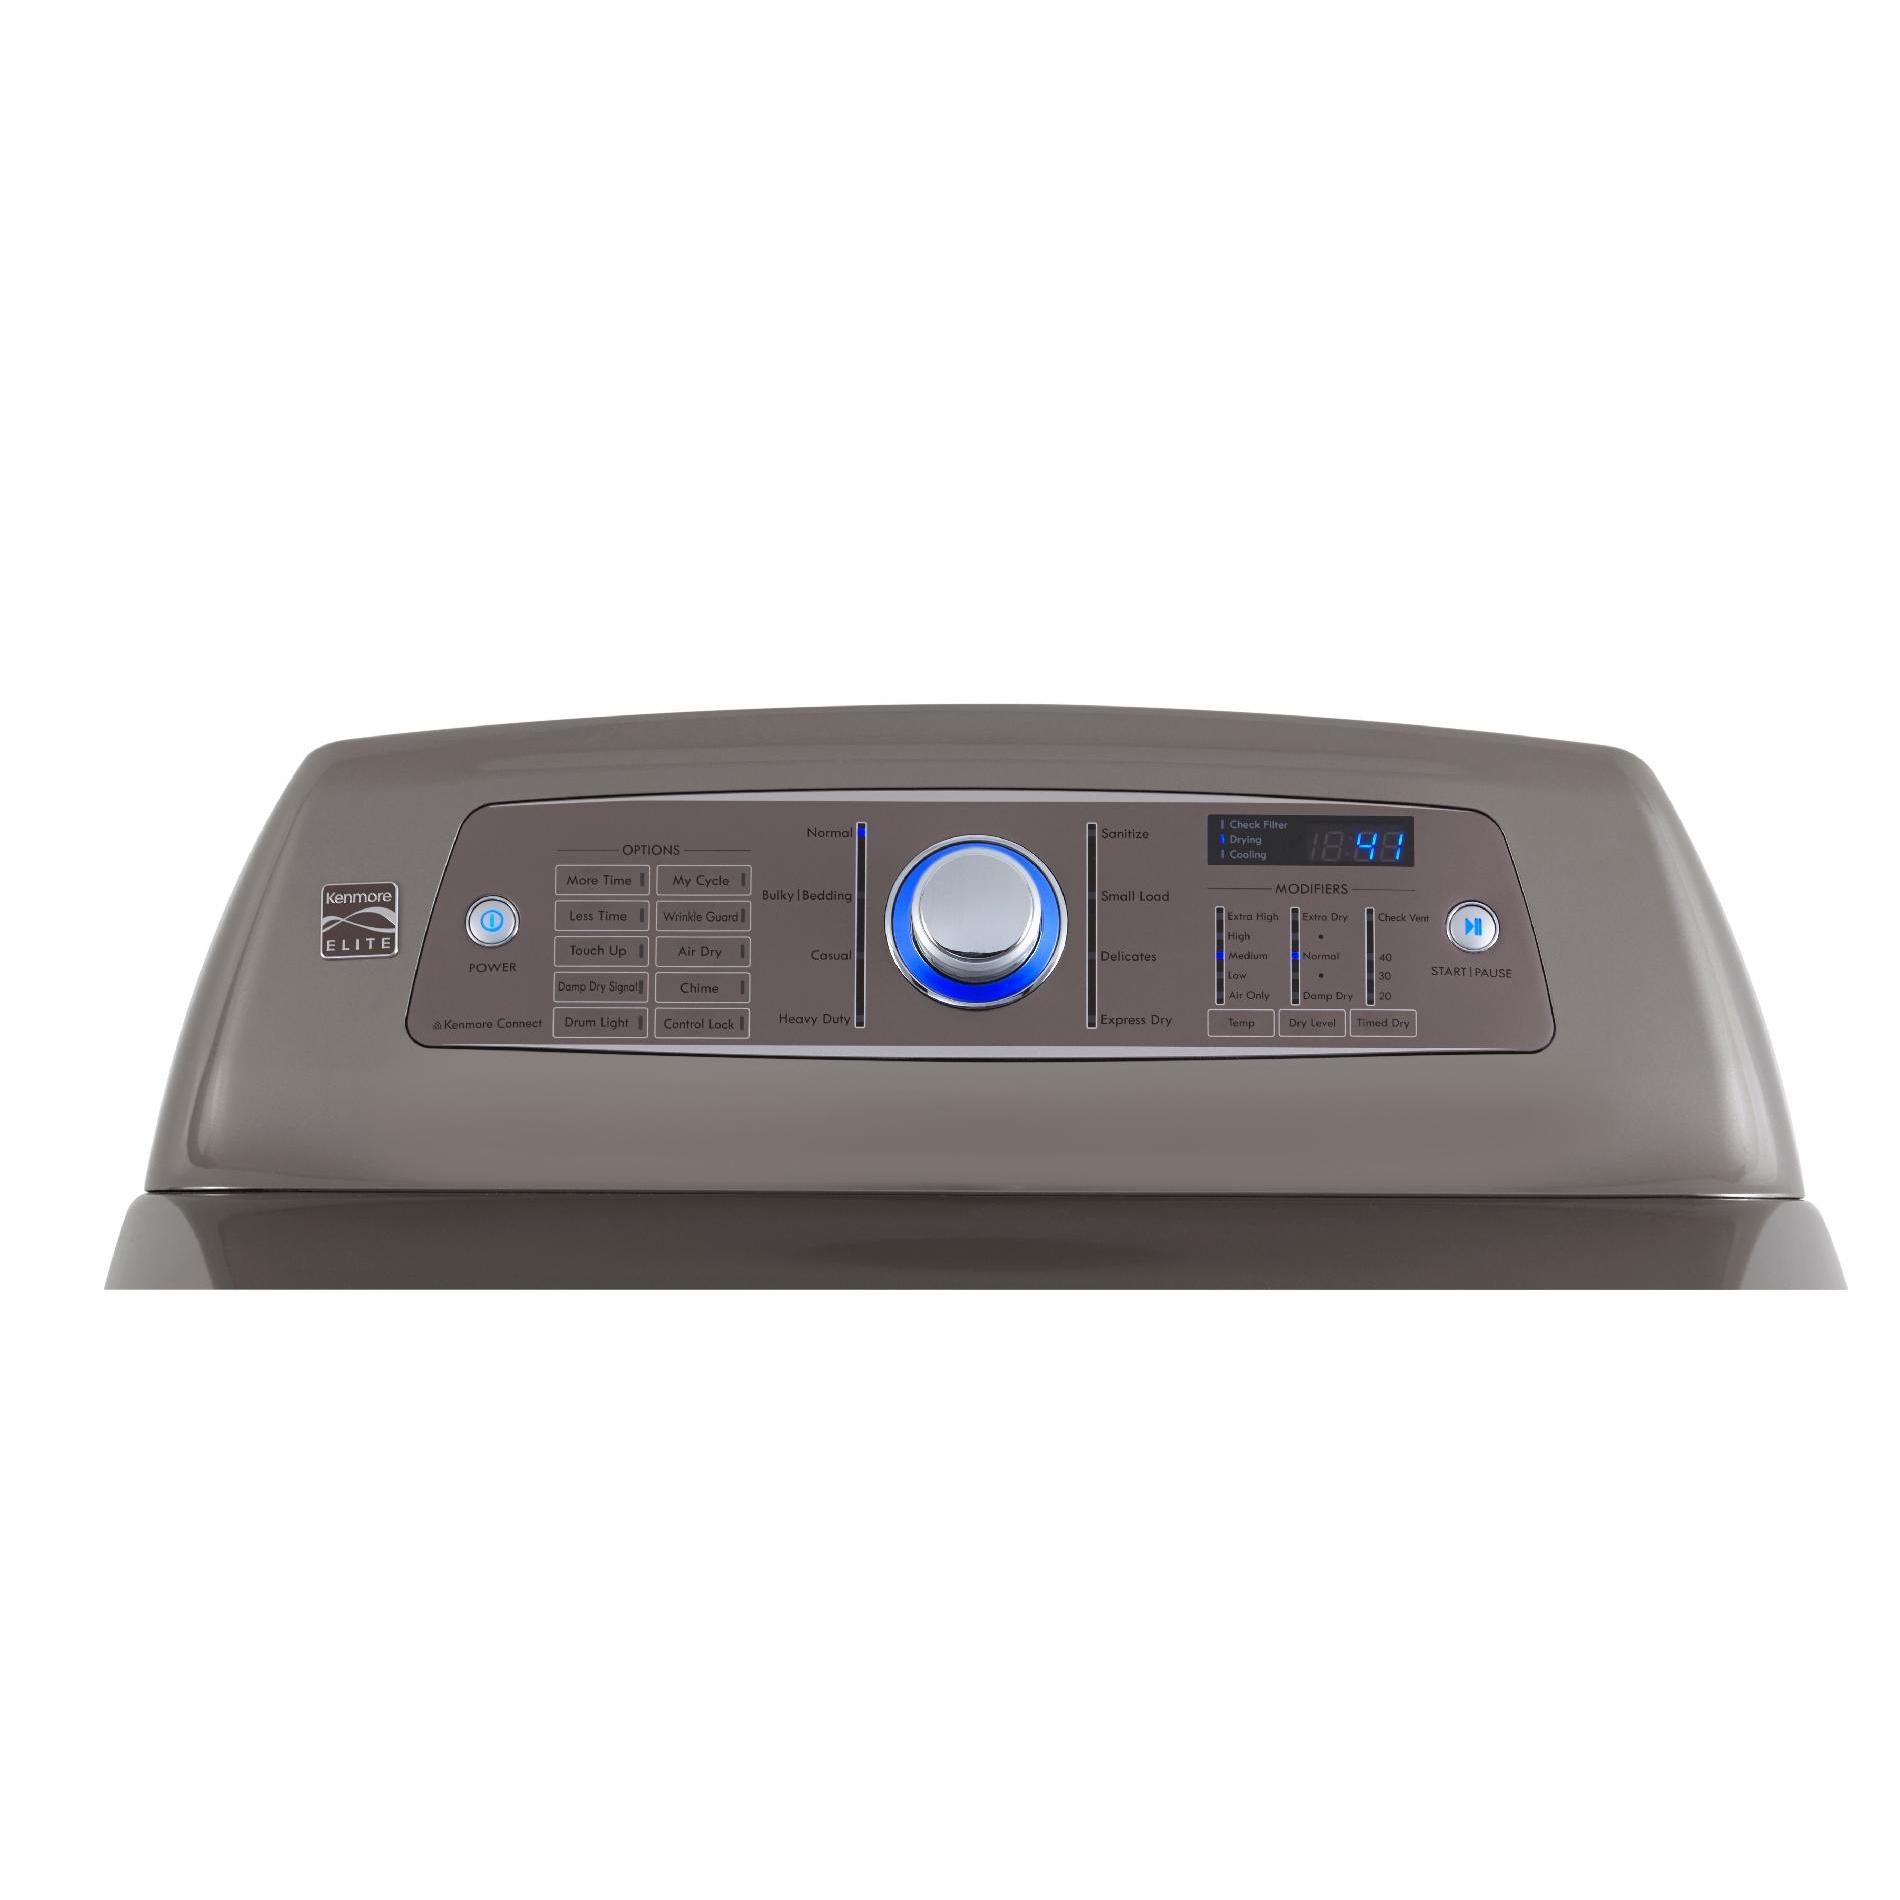 Kenmore Elite 7.3 cu. ft. Gas Dryer w/ Dual Sensor Dry - Metallic Silver